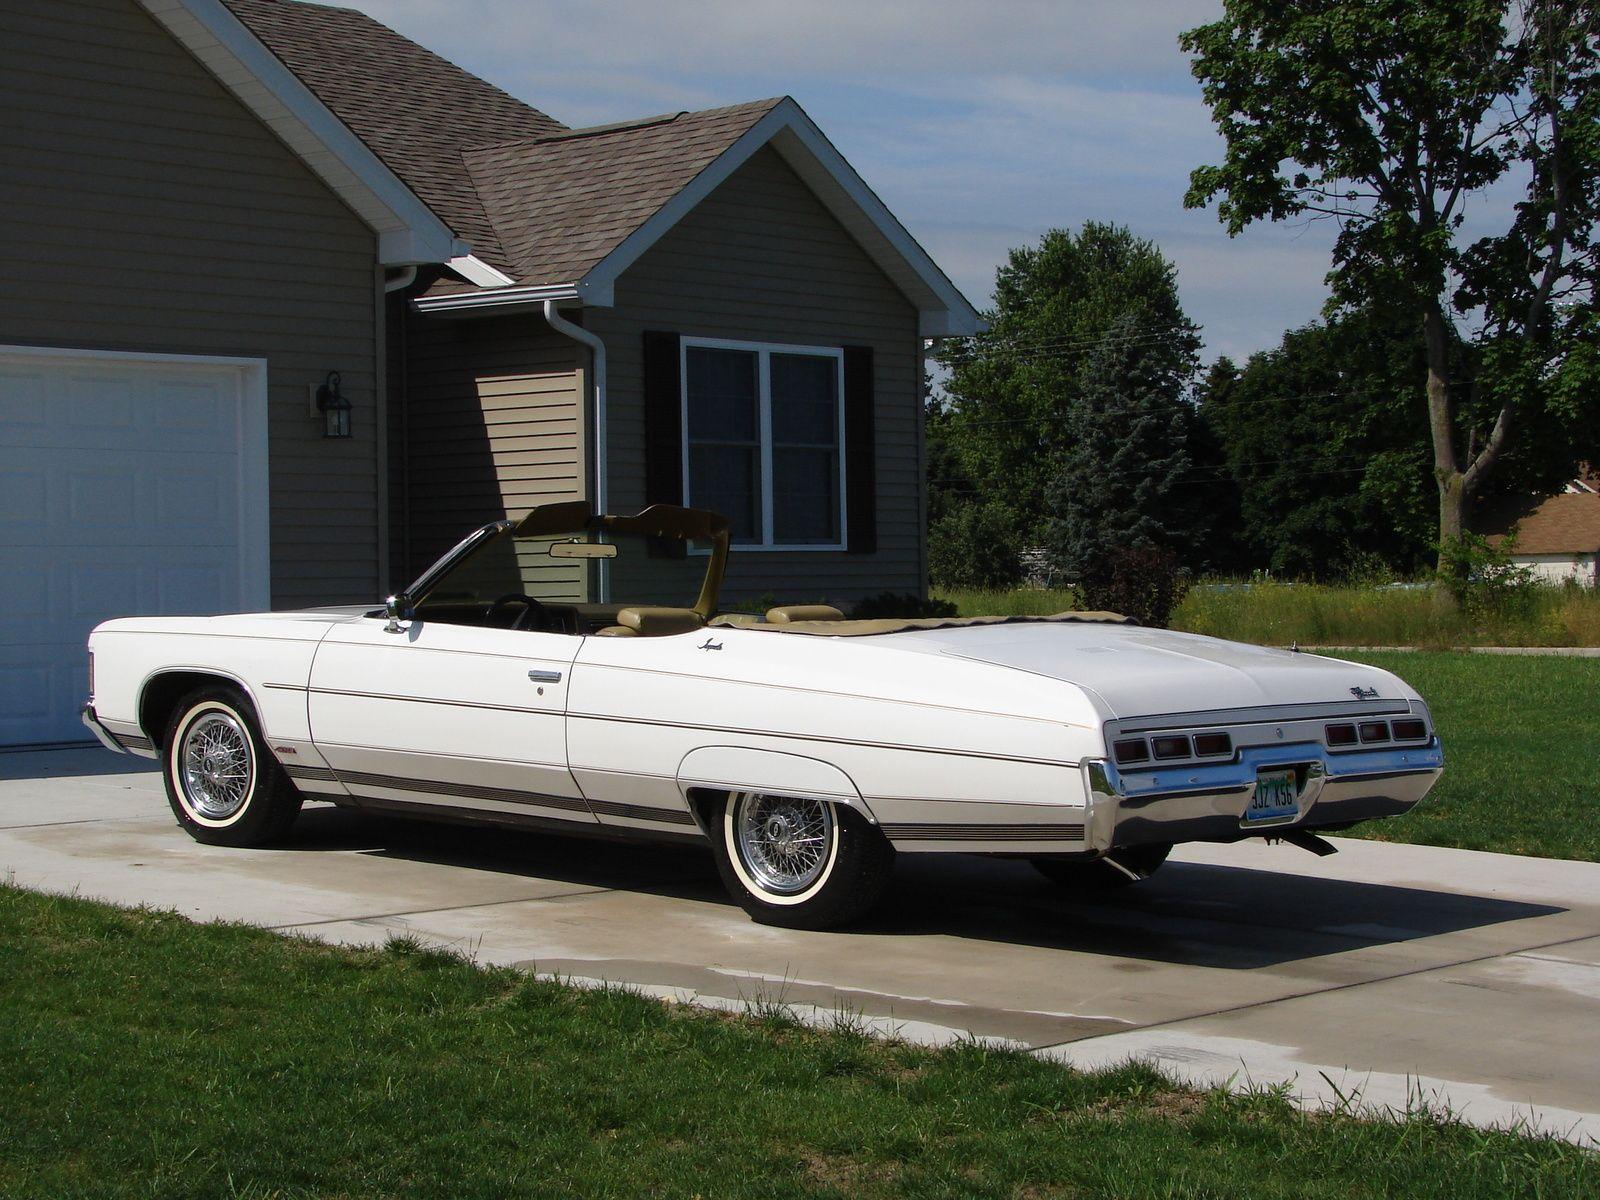 1970 chevy impala 4 door sedan chevrolet pinterest chevy impala impalas and sedans